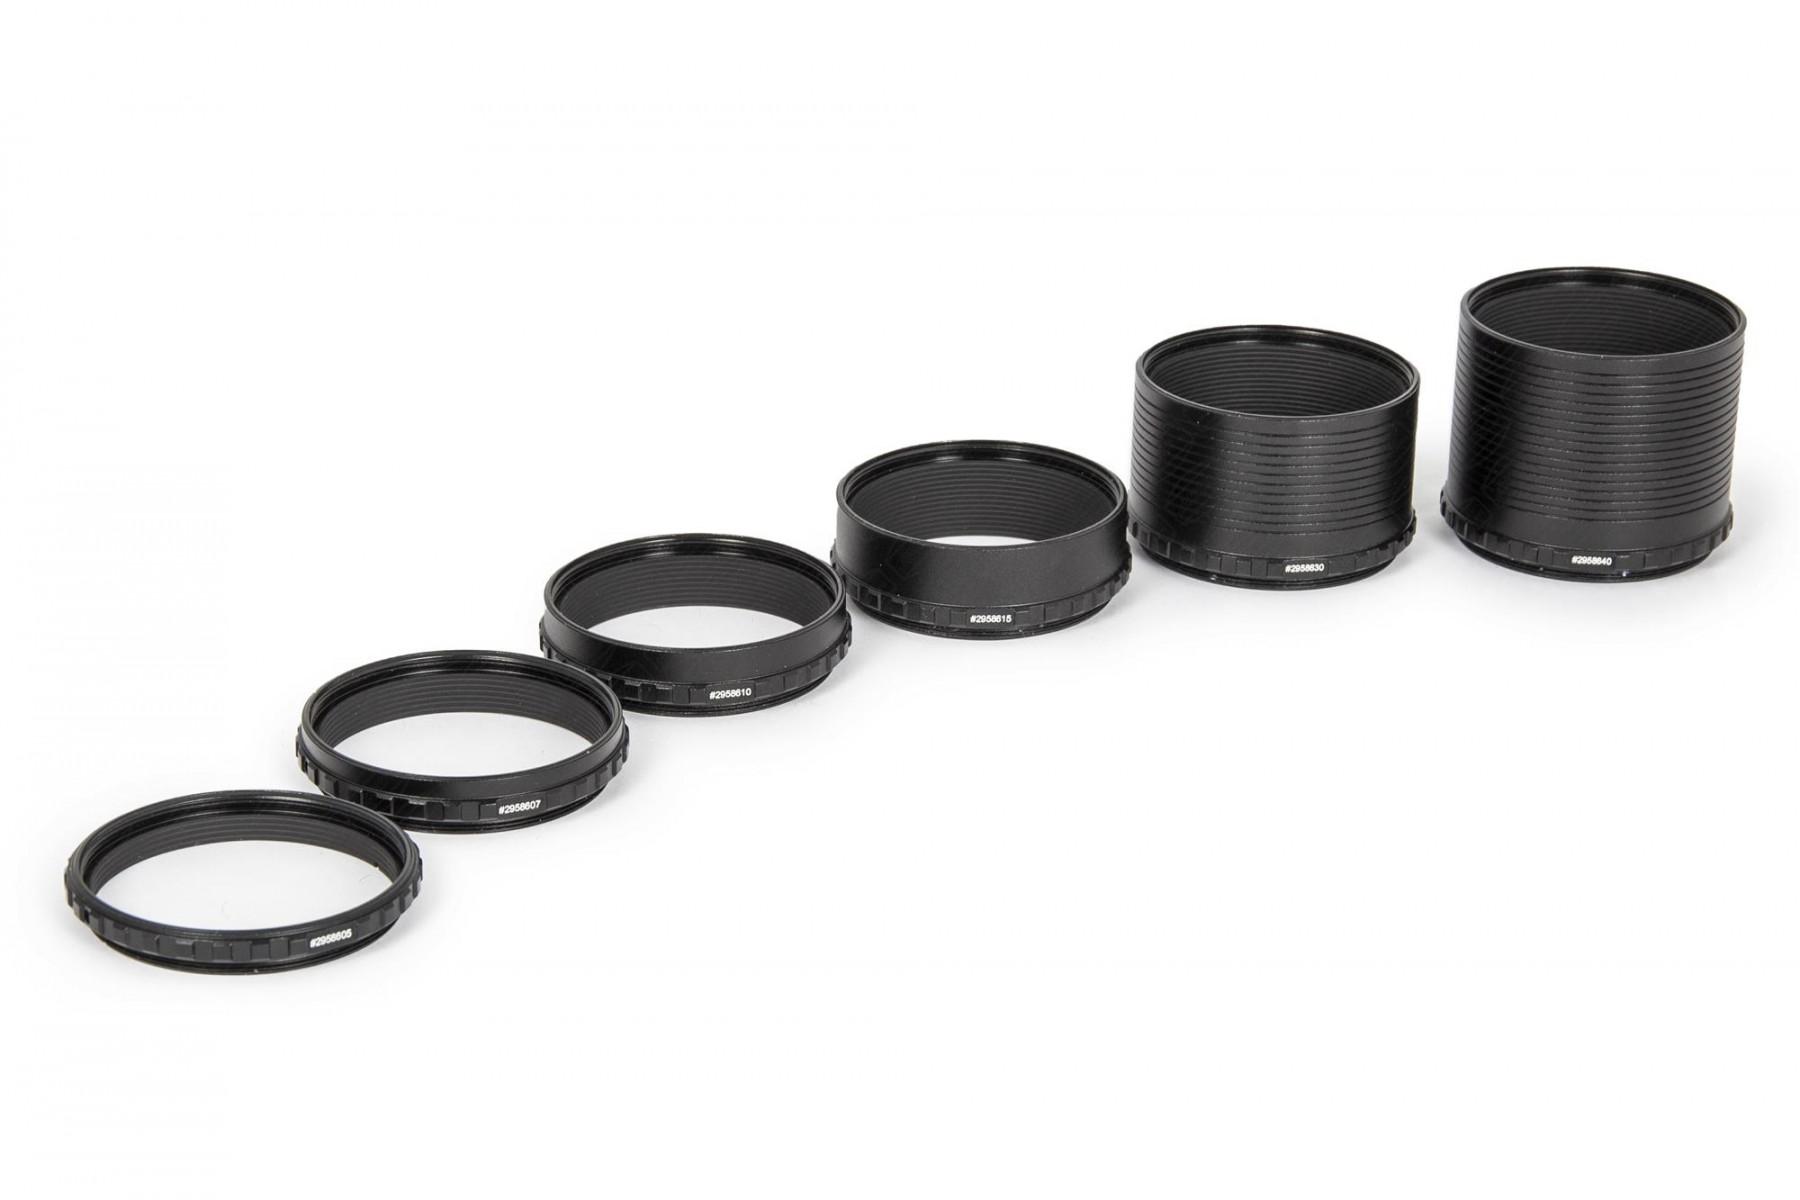 M48 Adjustkment rings (5 mm, 7,5 mm, 10 mm, 15 mm, 30mm, 40 mm)